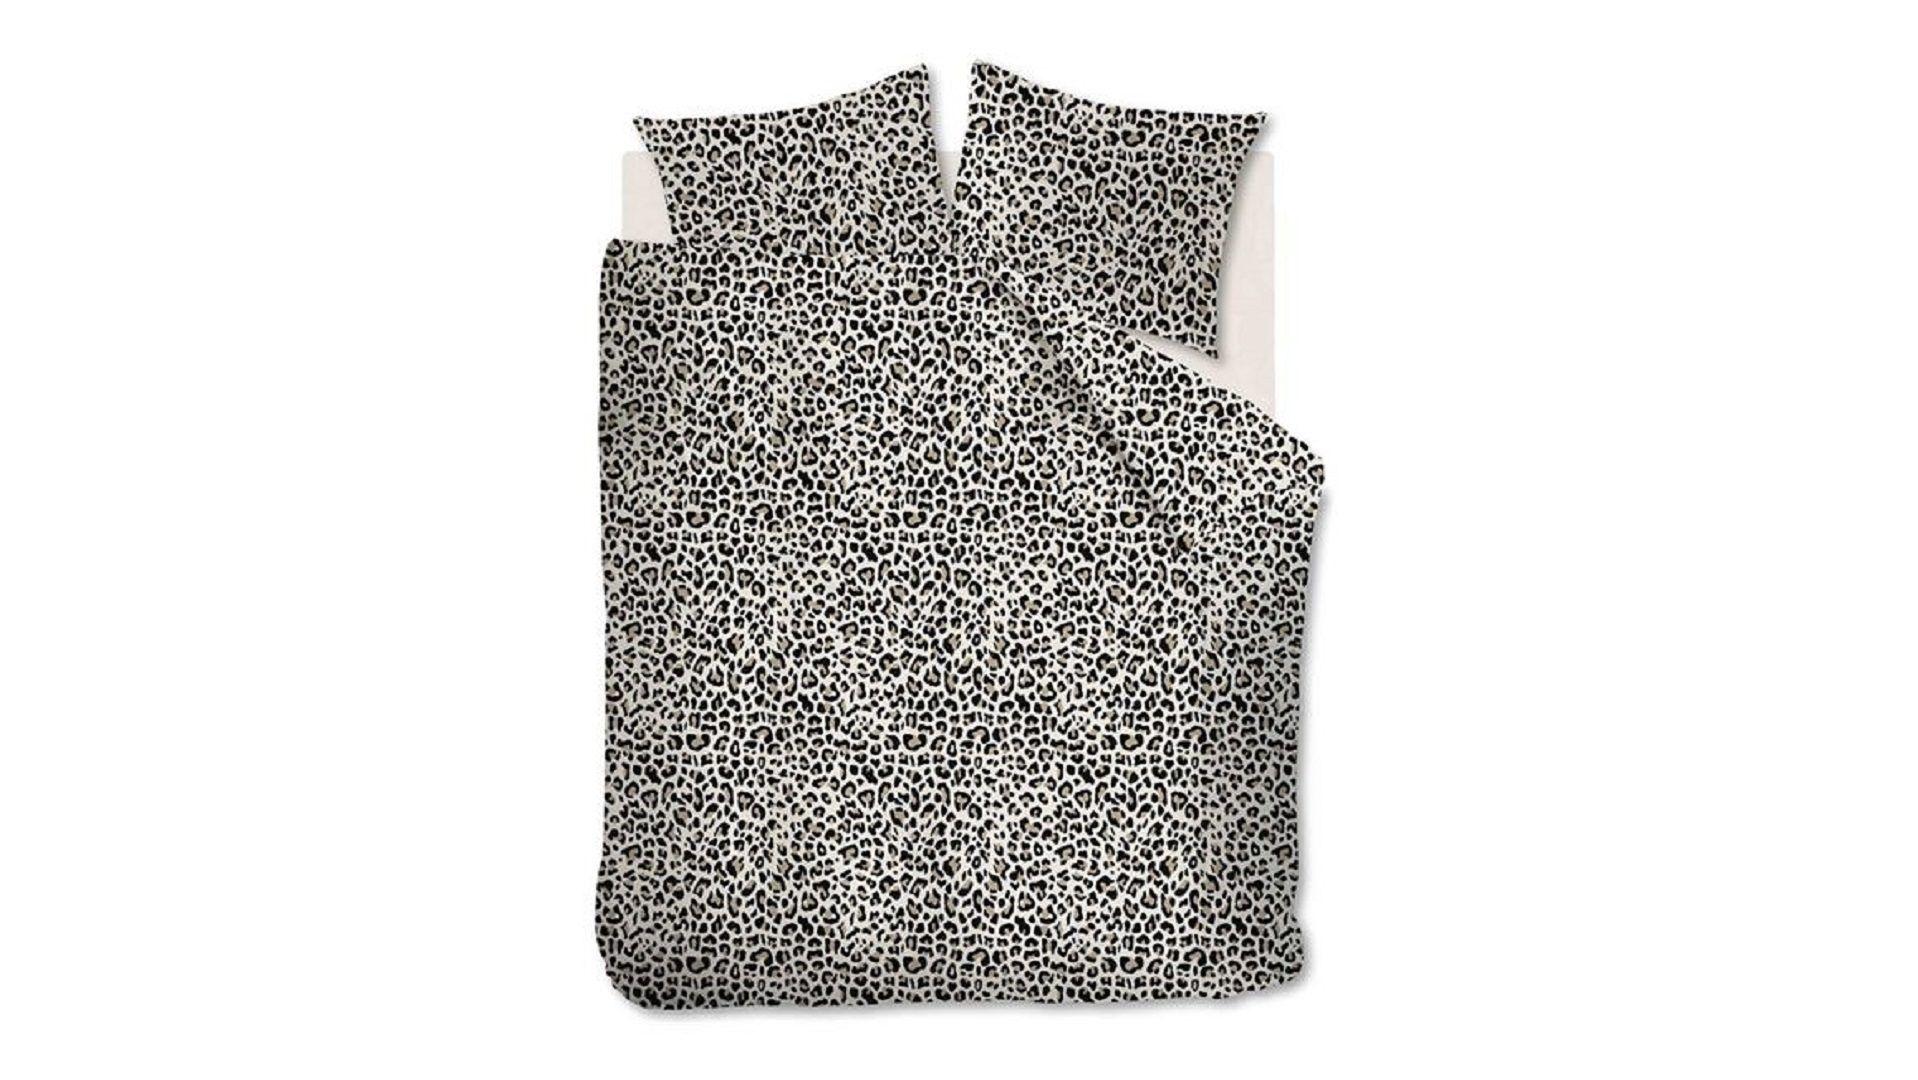 Ambiante Leopard panter dekbedovertrek